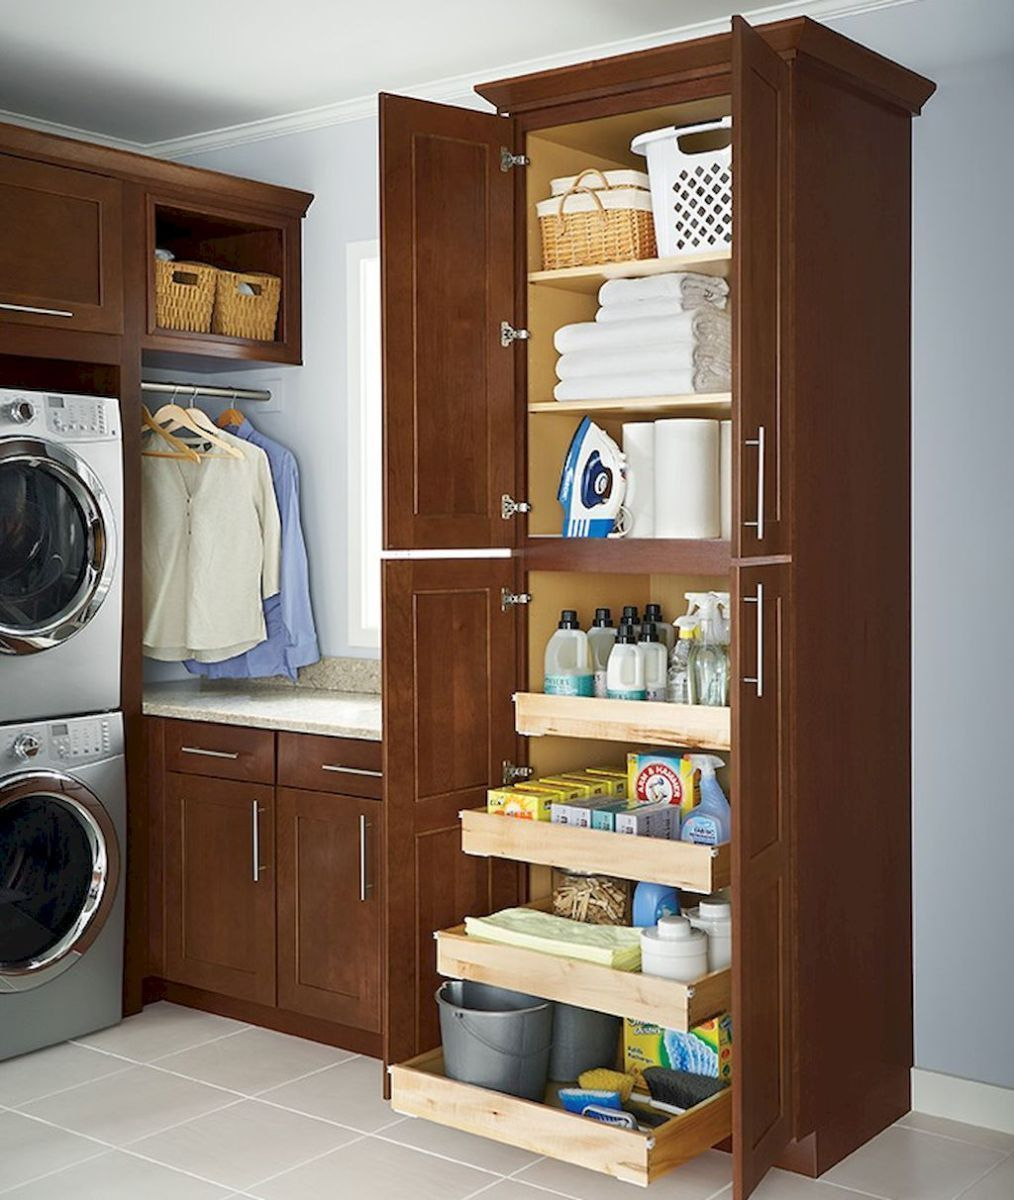 diy laundry room storage shelves ideas 71 diy laundry on lowe s laundry room storage cabinets id=18363